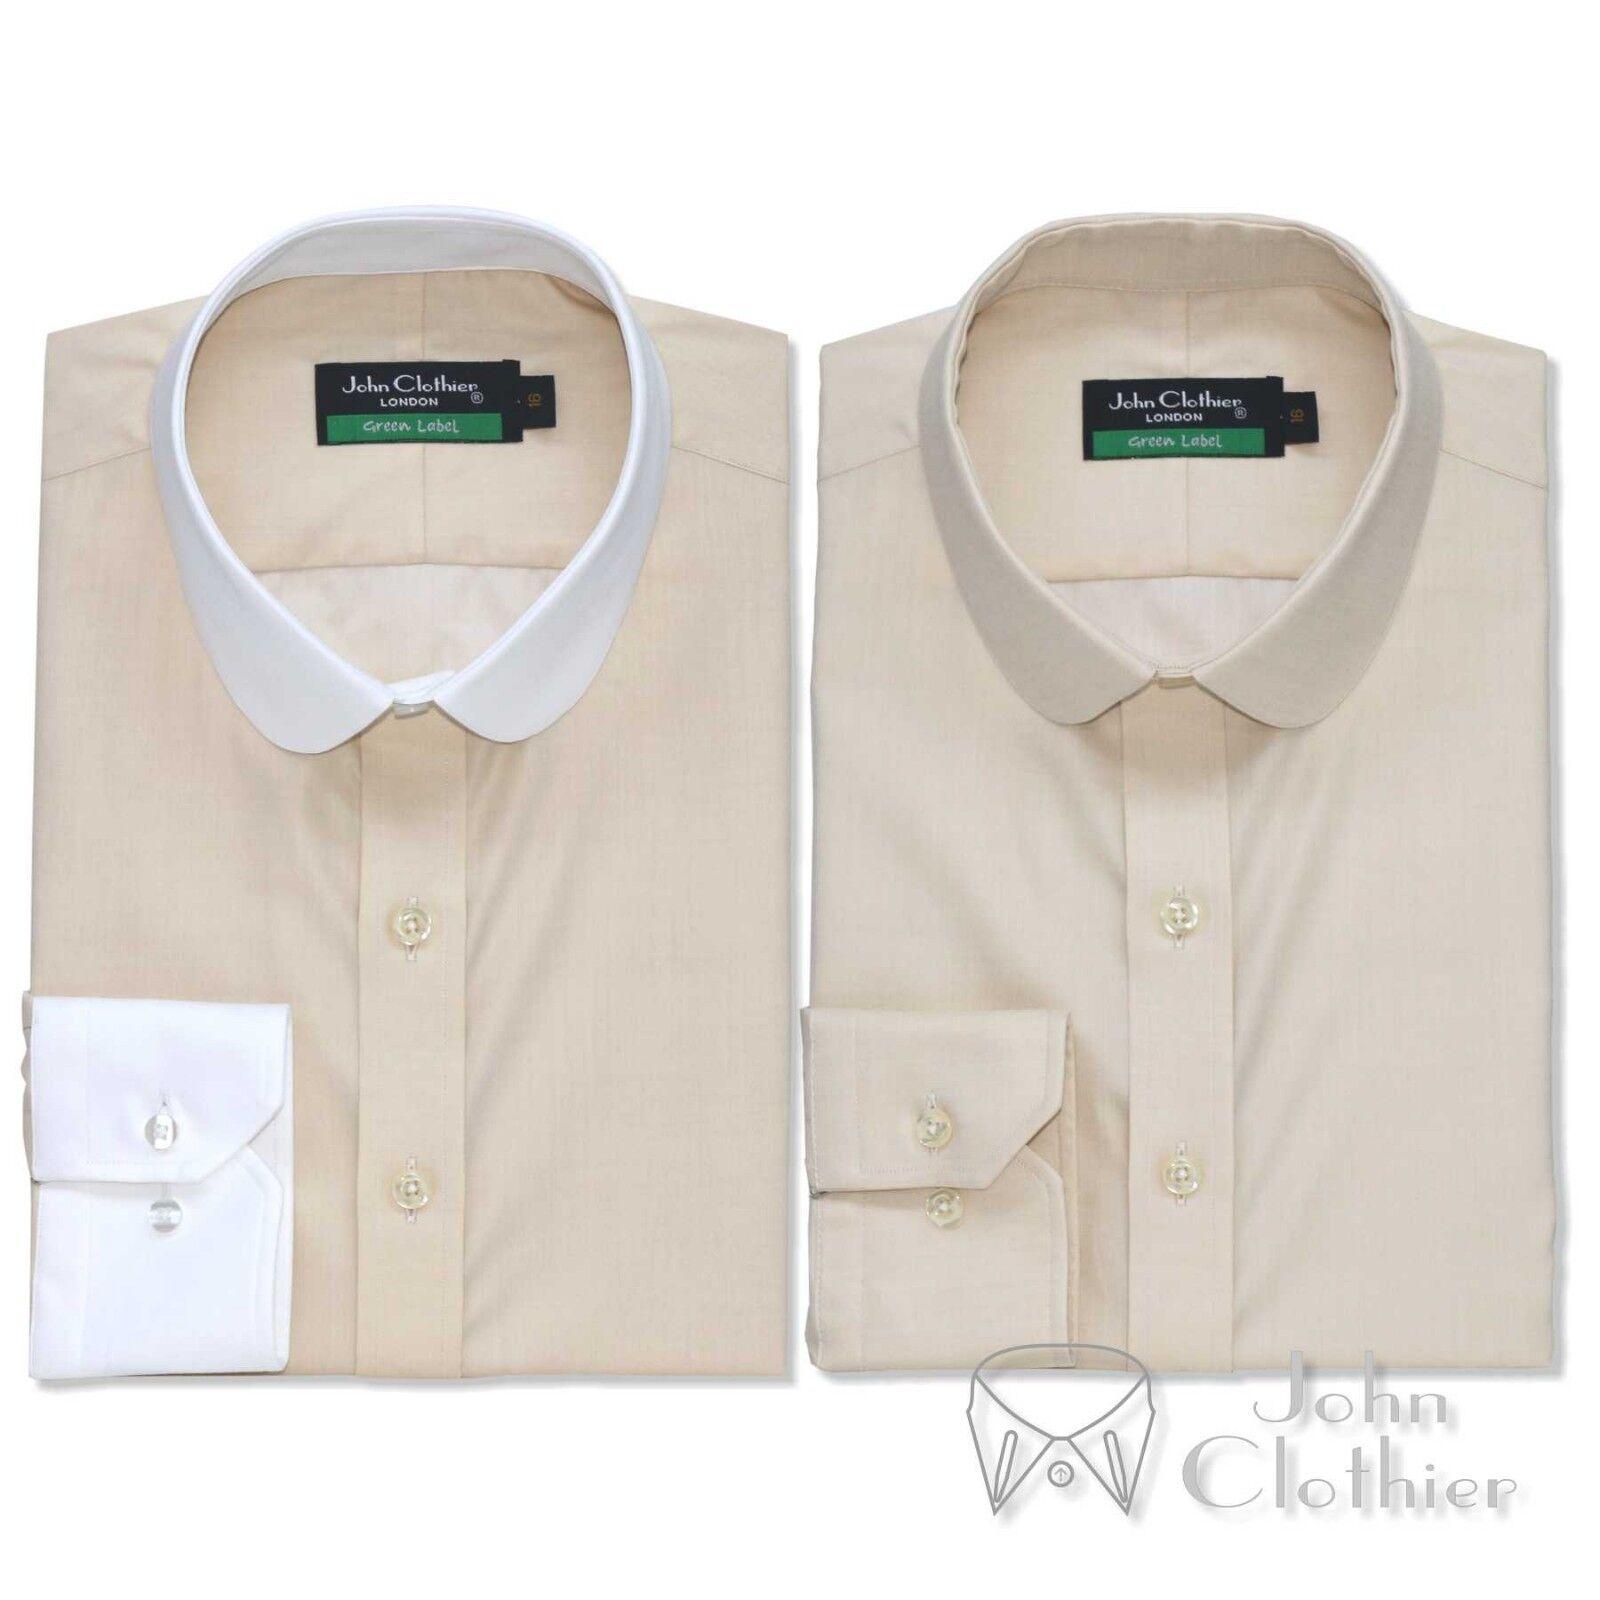 Herren Penny collar Cotton shirt Fawn milange plain Bankers Weiß Club Round Gents